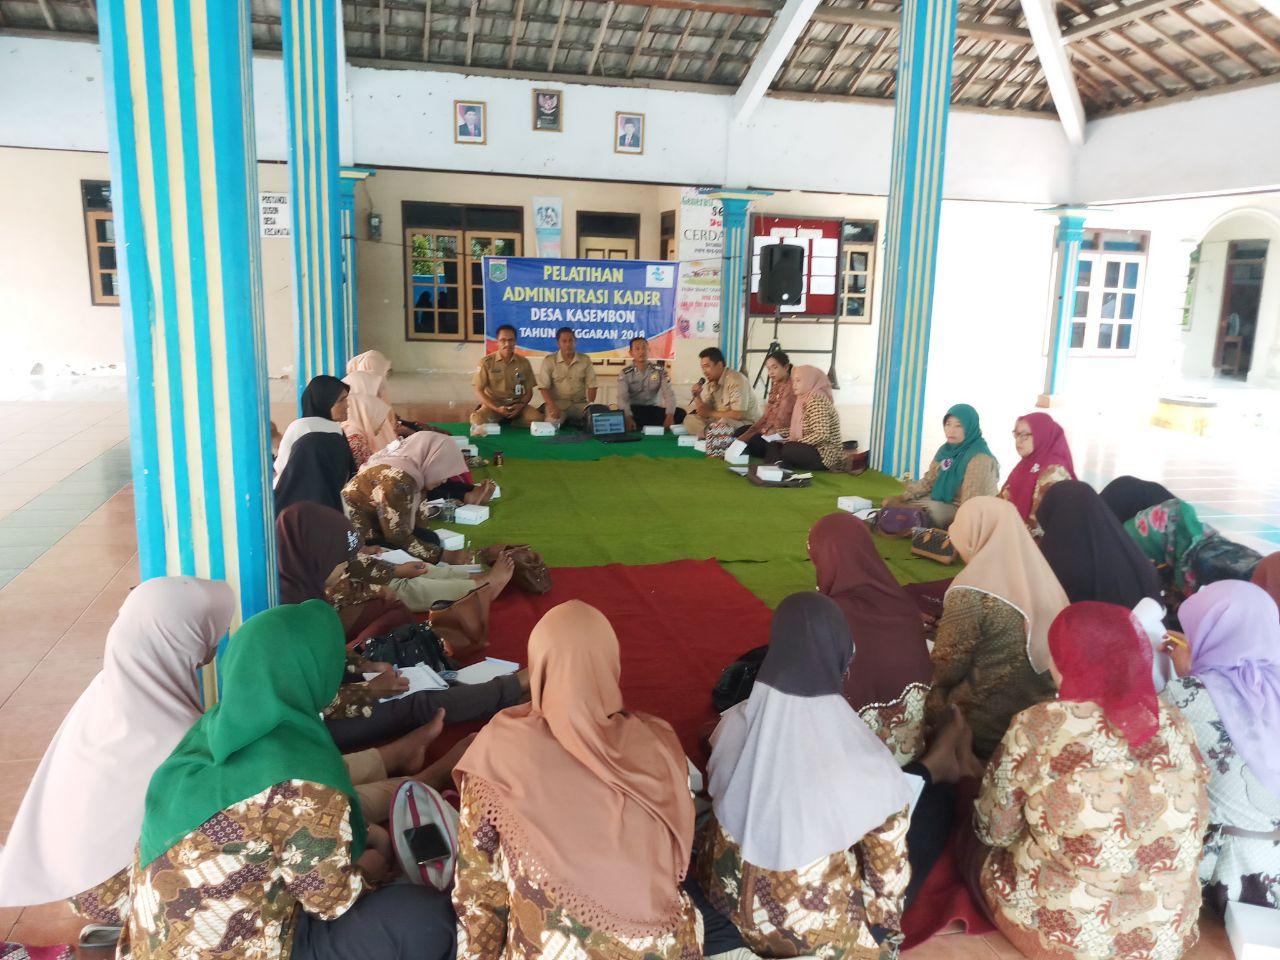 Demi Menjalin Kedekatan Dengan Warga Binaan, Anggota Bhabinkamtibmas Polsek Kasembon Polres Batu Sambang Desa